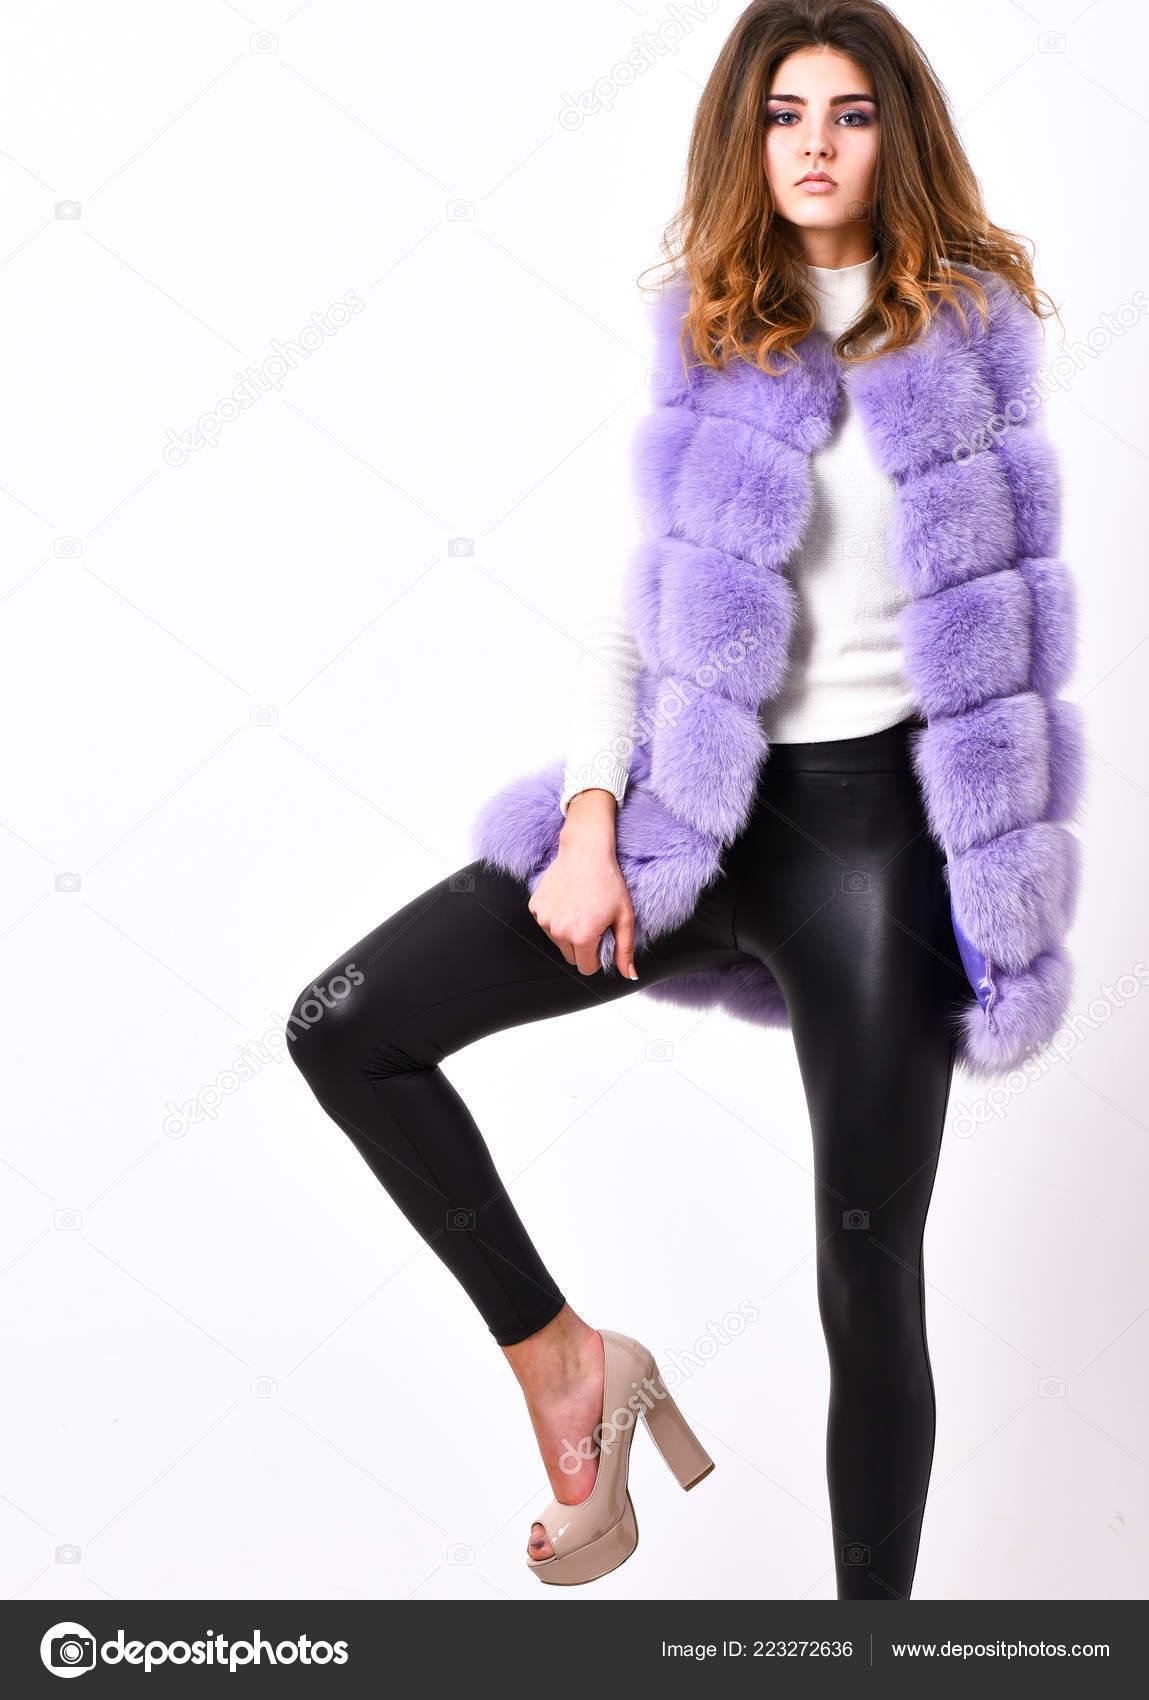 0fce76f143ccd8 Fashion trend concept. Winter fashionable wardrobe for female. Boutique  selling fur. Violet fur vest fashion clothing.